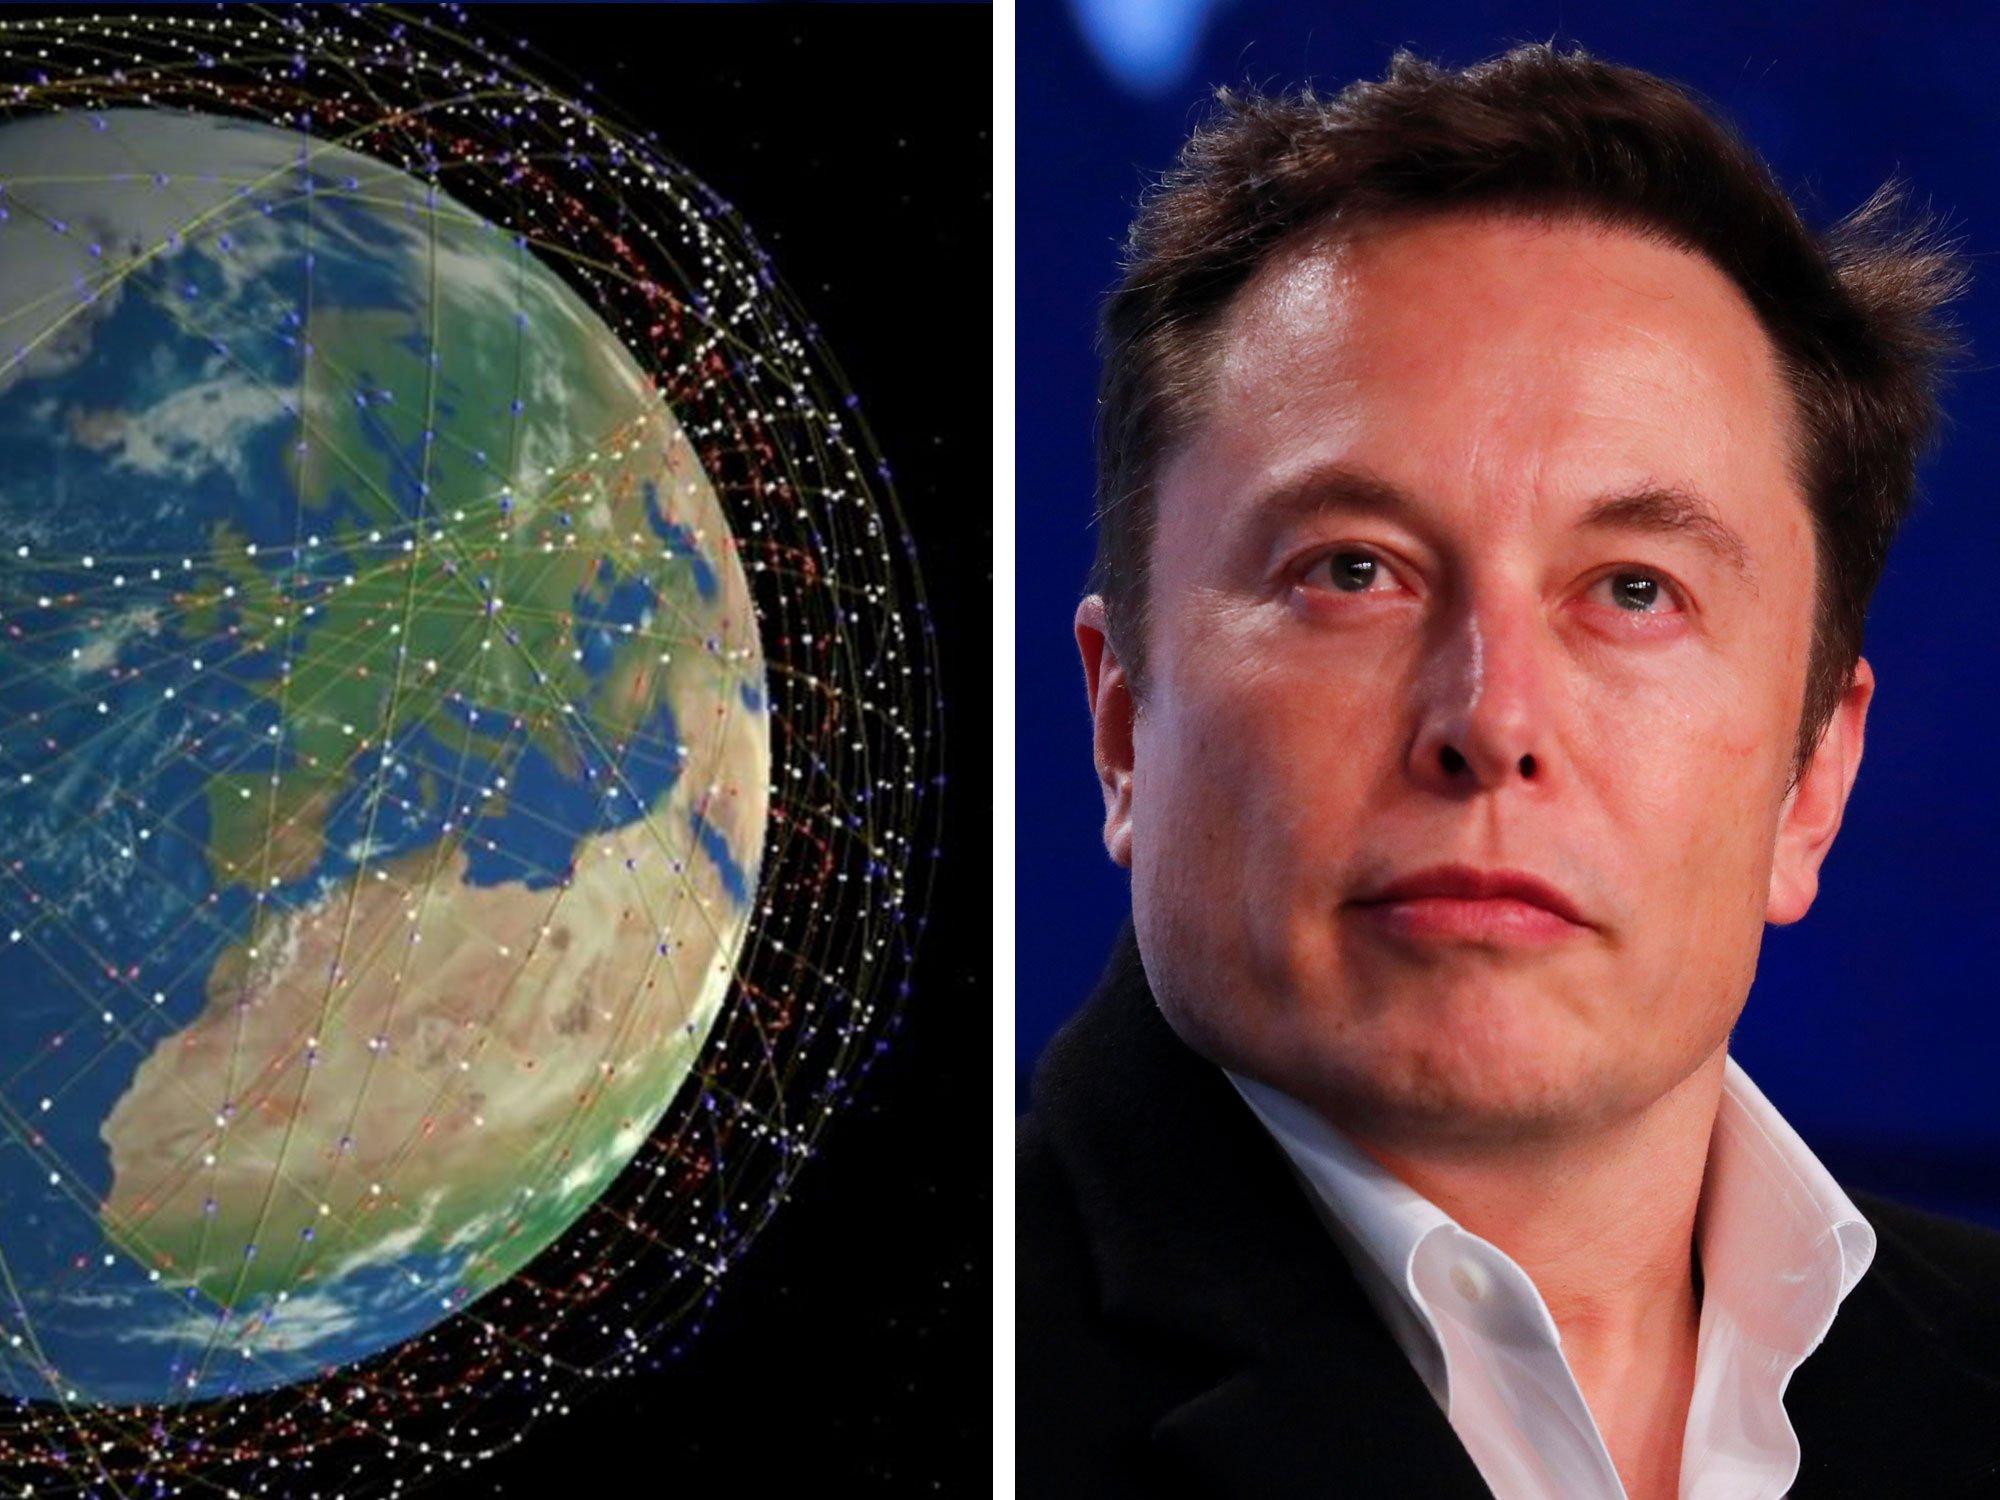 Starlink satelīti apkārt Zemei un Īlans Masks